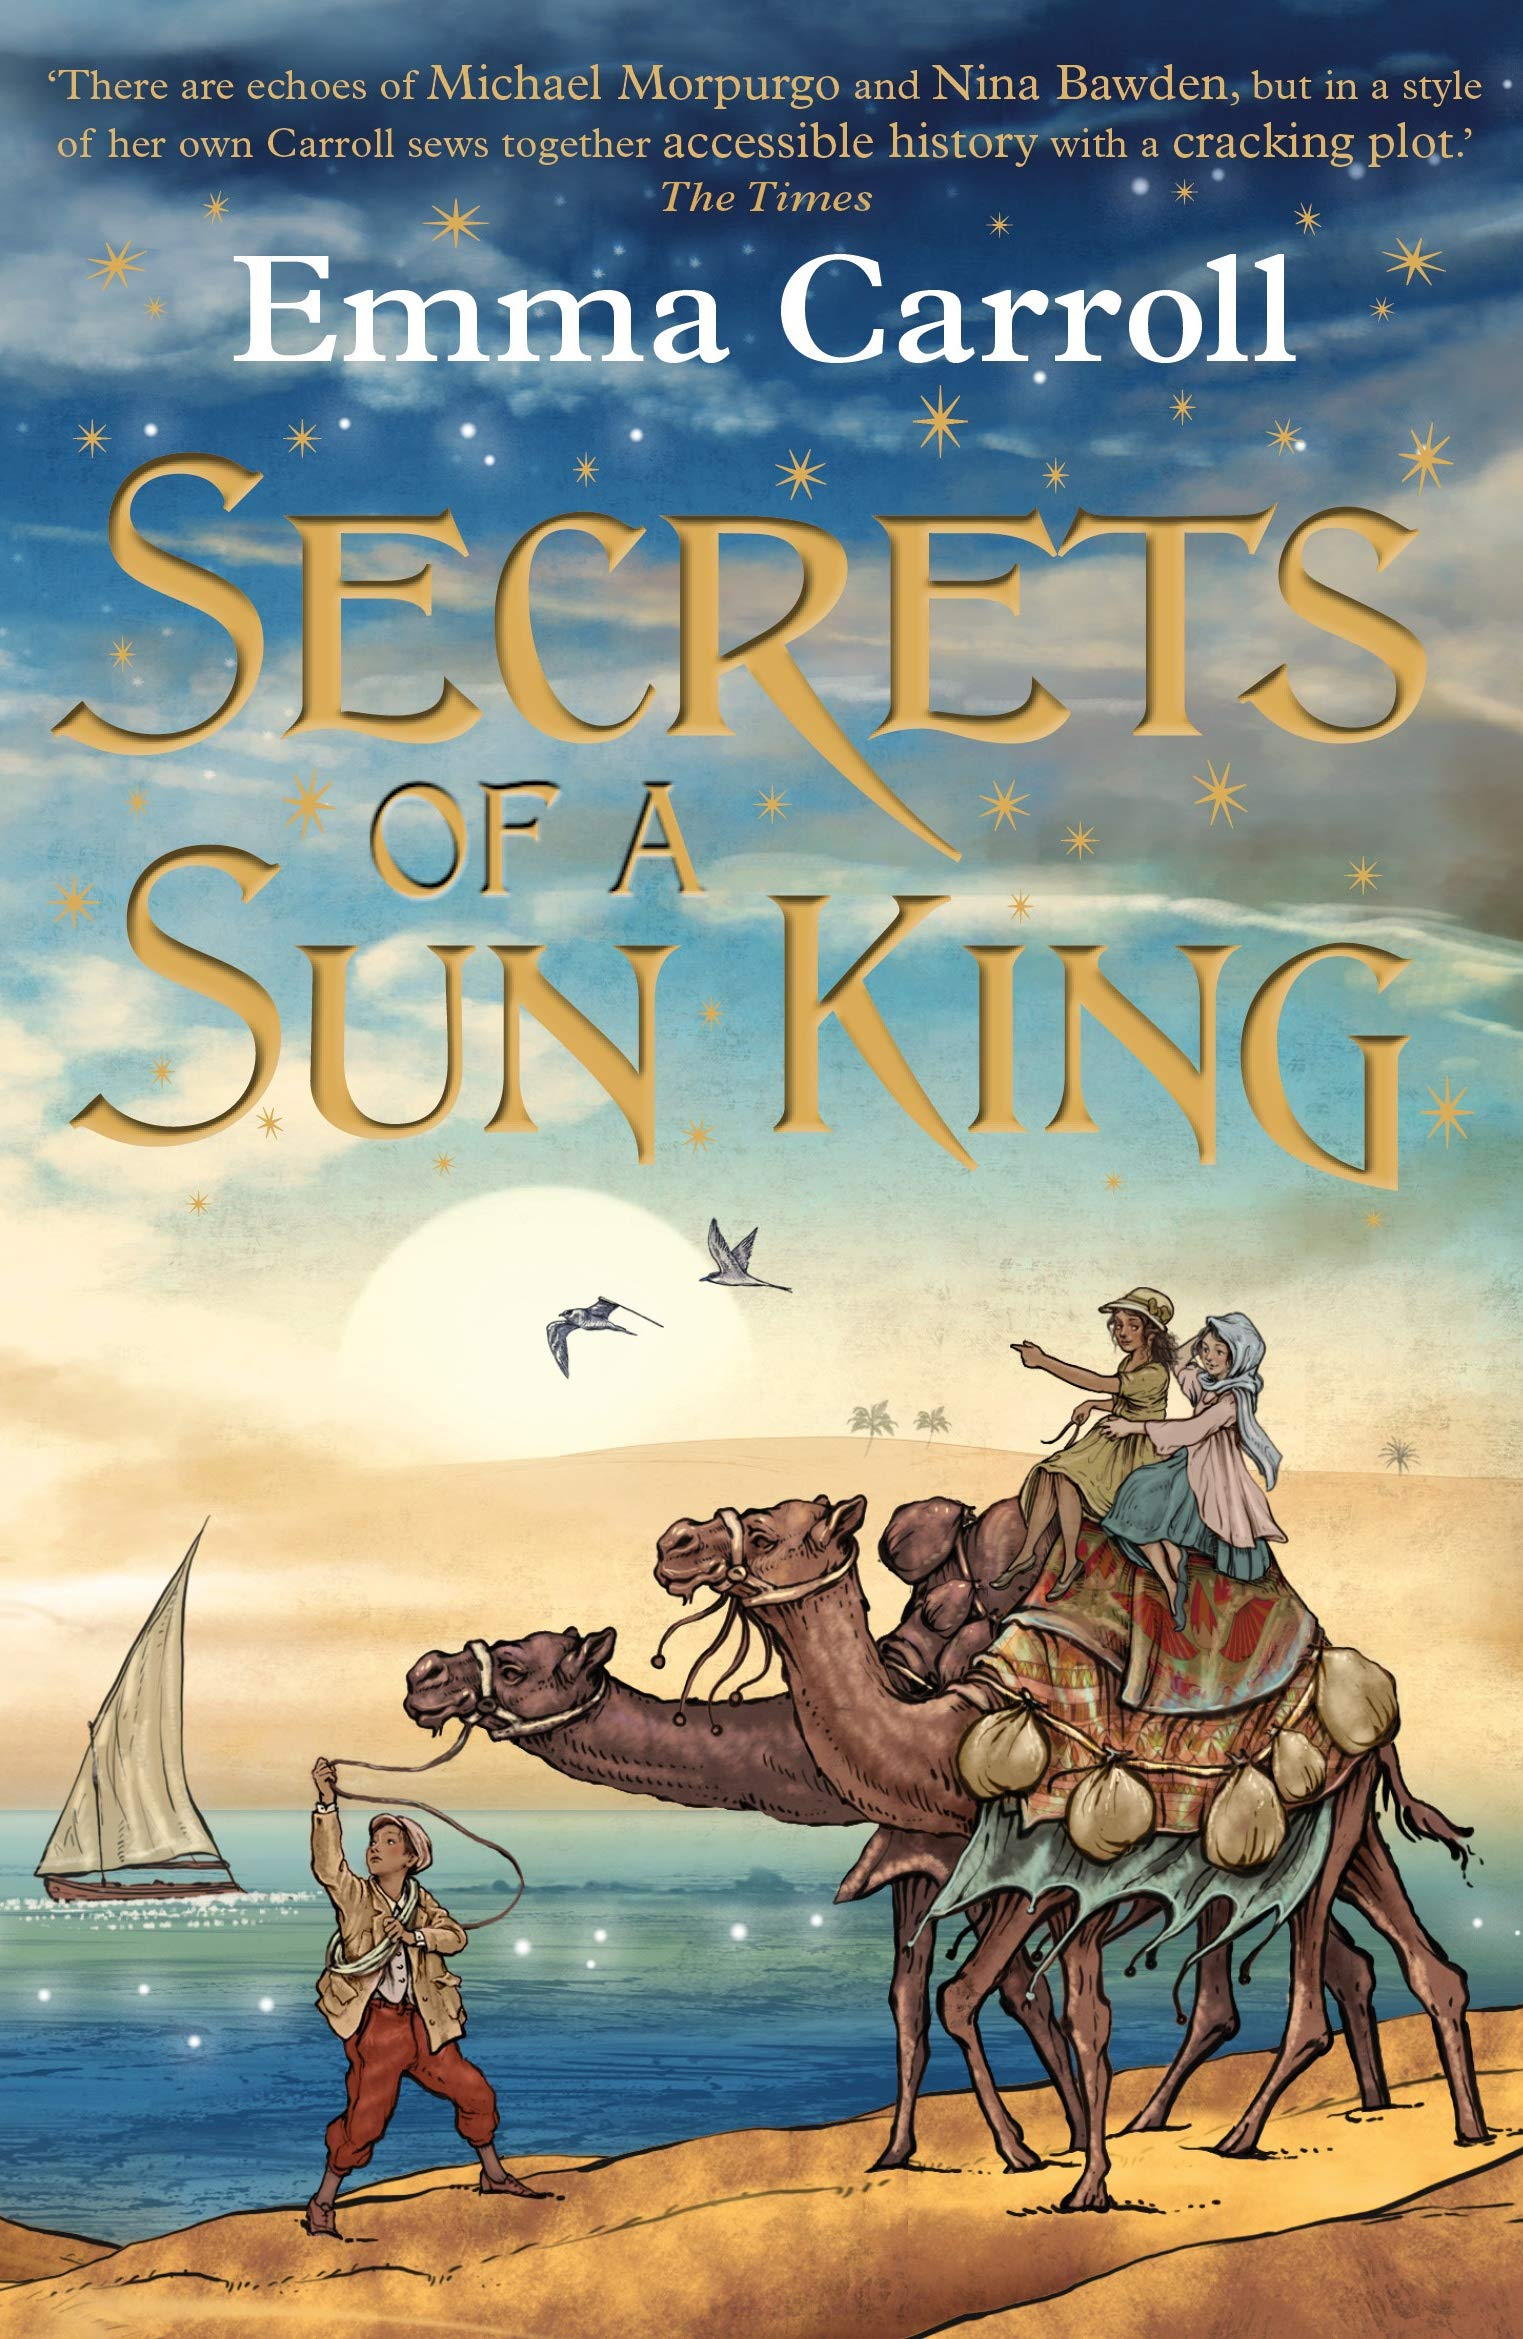 Secrets of a Sun King: Amazon.co.uk: Carroll, Emma: 9780571328499: Books